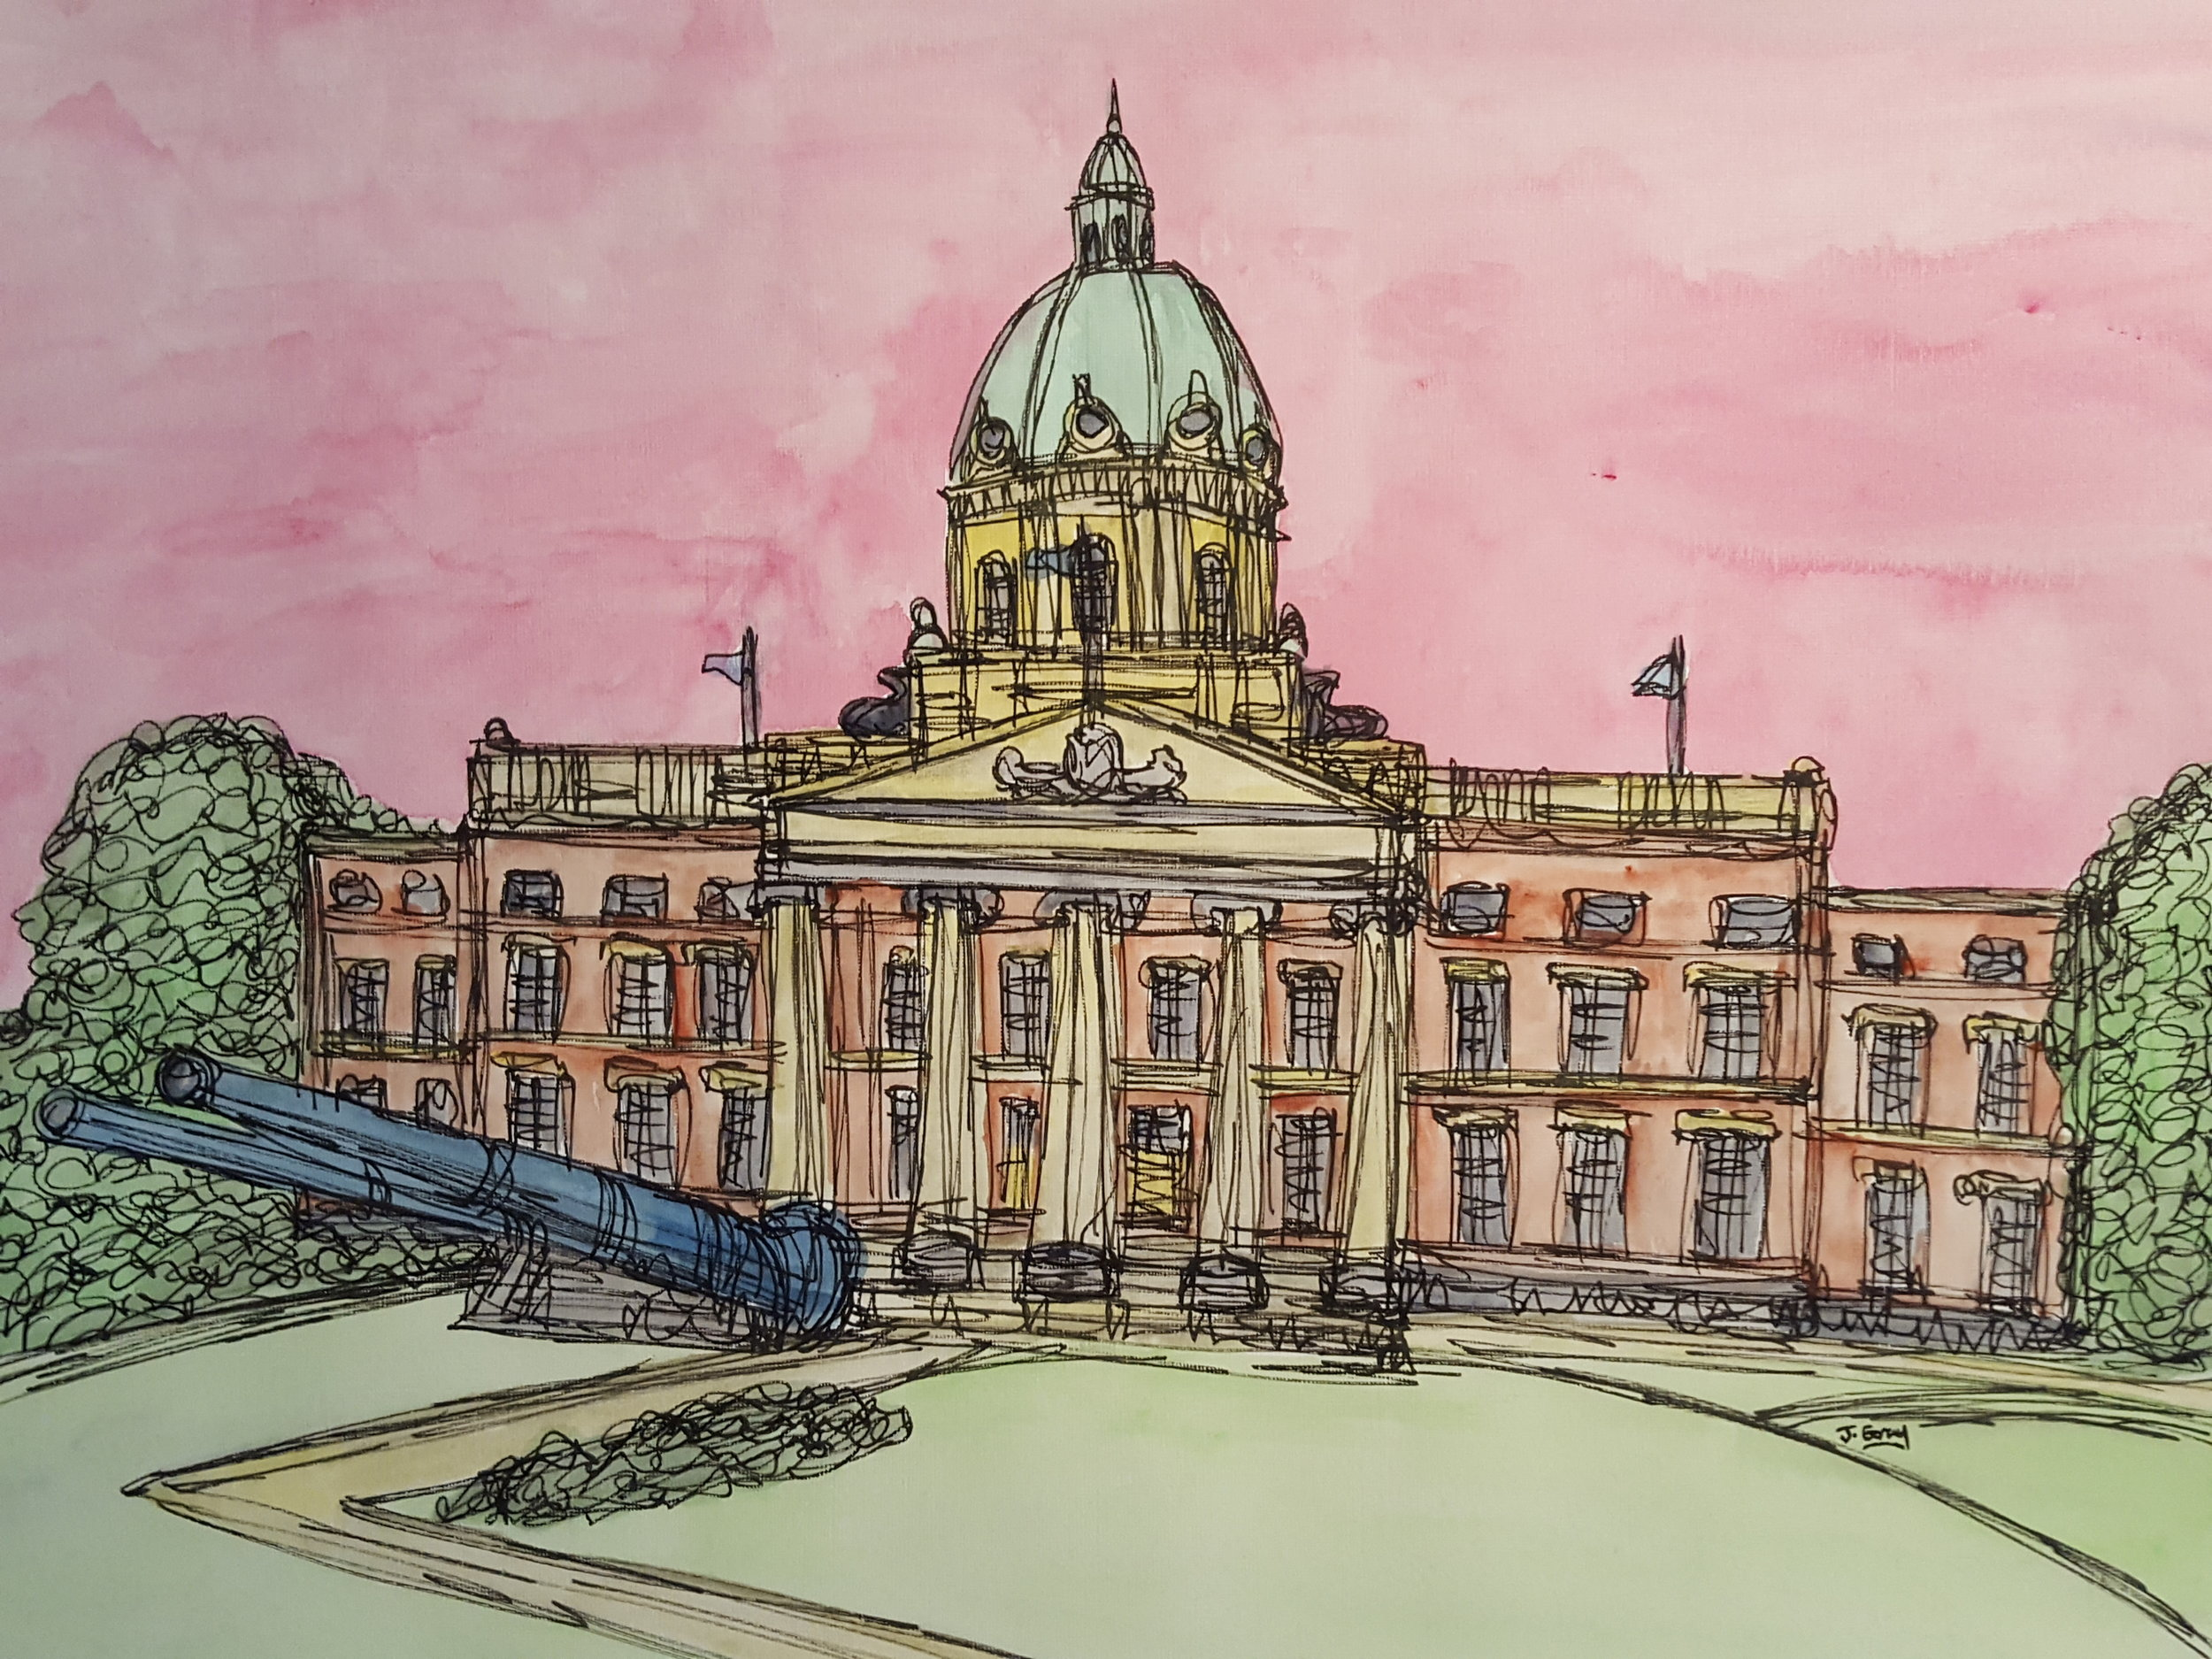 Imperial War Museum, 2018 | Watercolour & Fine liner on paper | 43 x 53 cm | £295